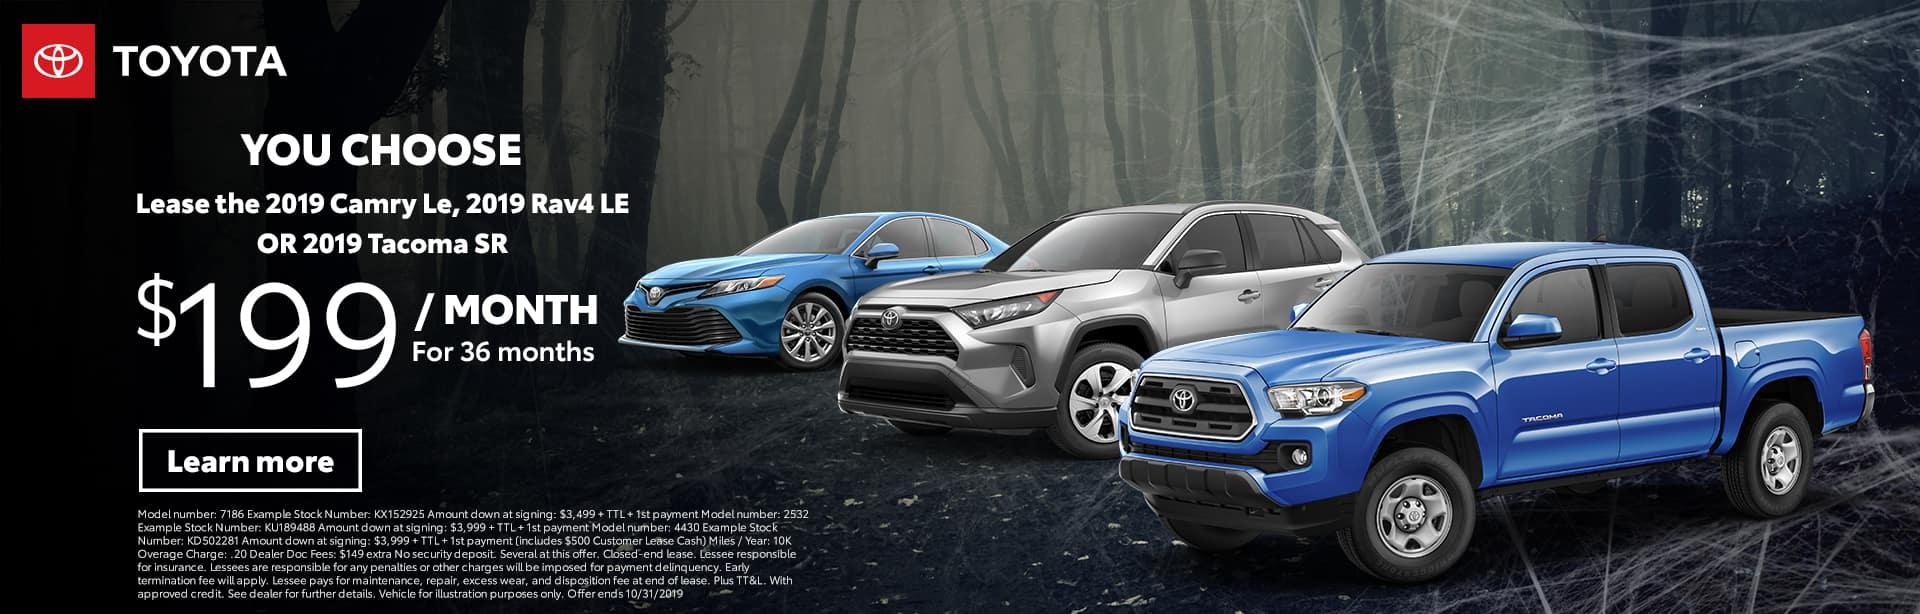 Toyota Dealers Okc >> Toyota Dealers Okc New Car Release Date